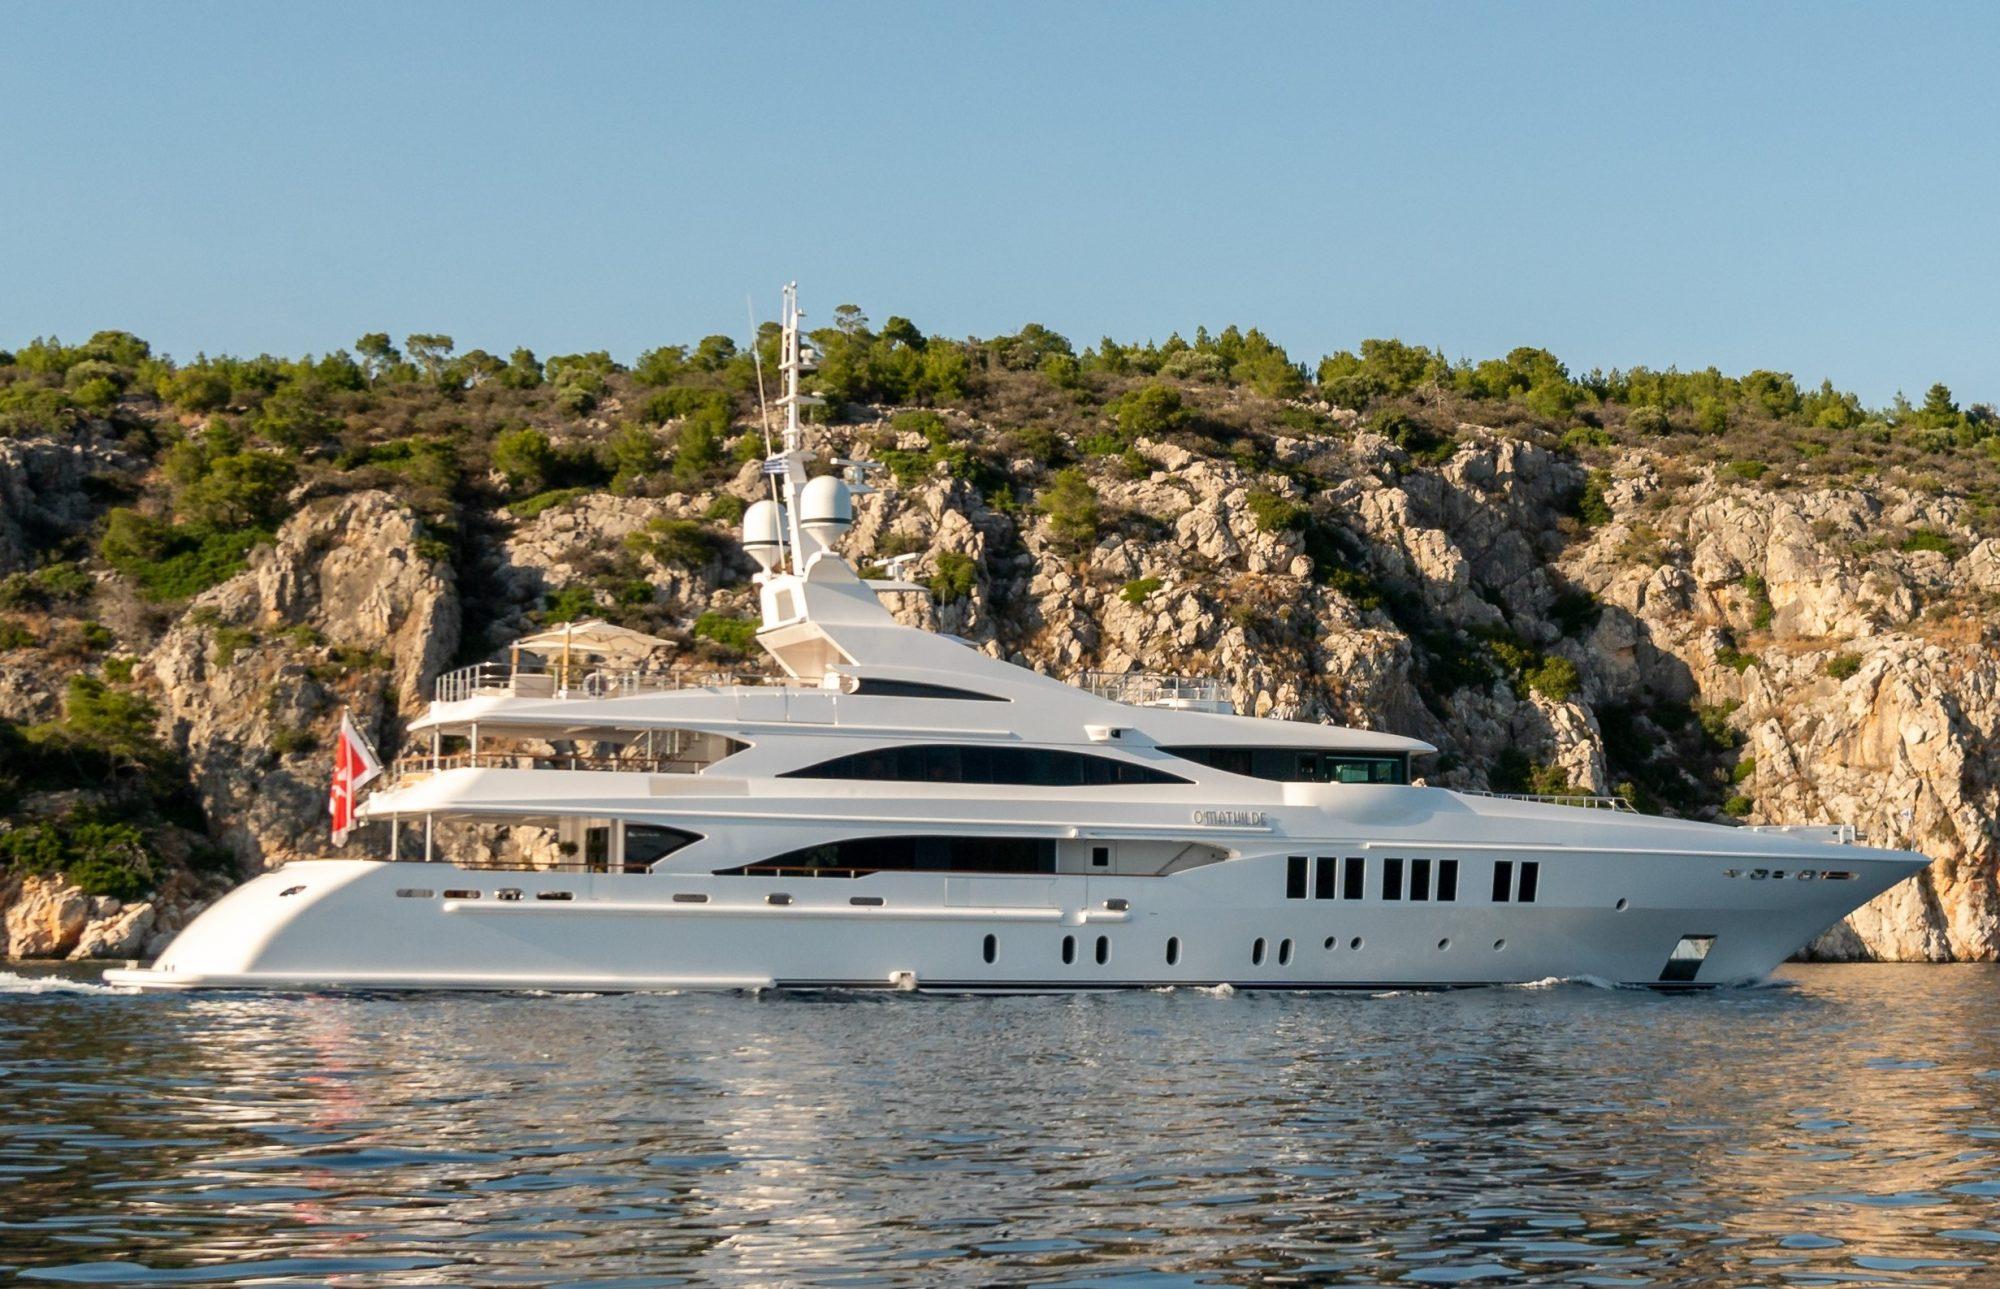 Motor Yacht O'MATHILDE for Charter with SuperYachtsMonaco